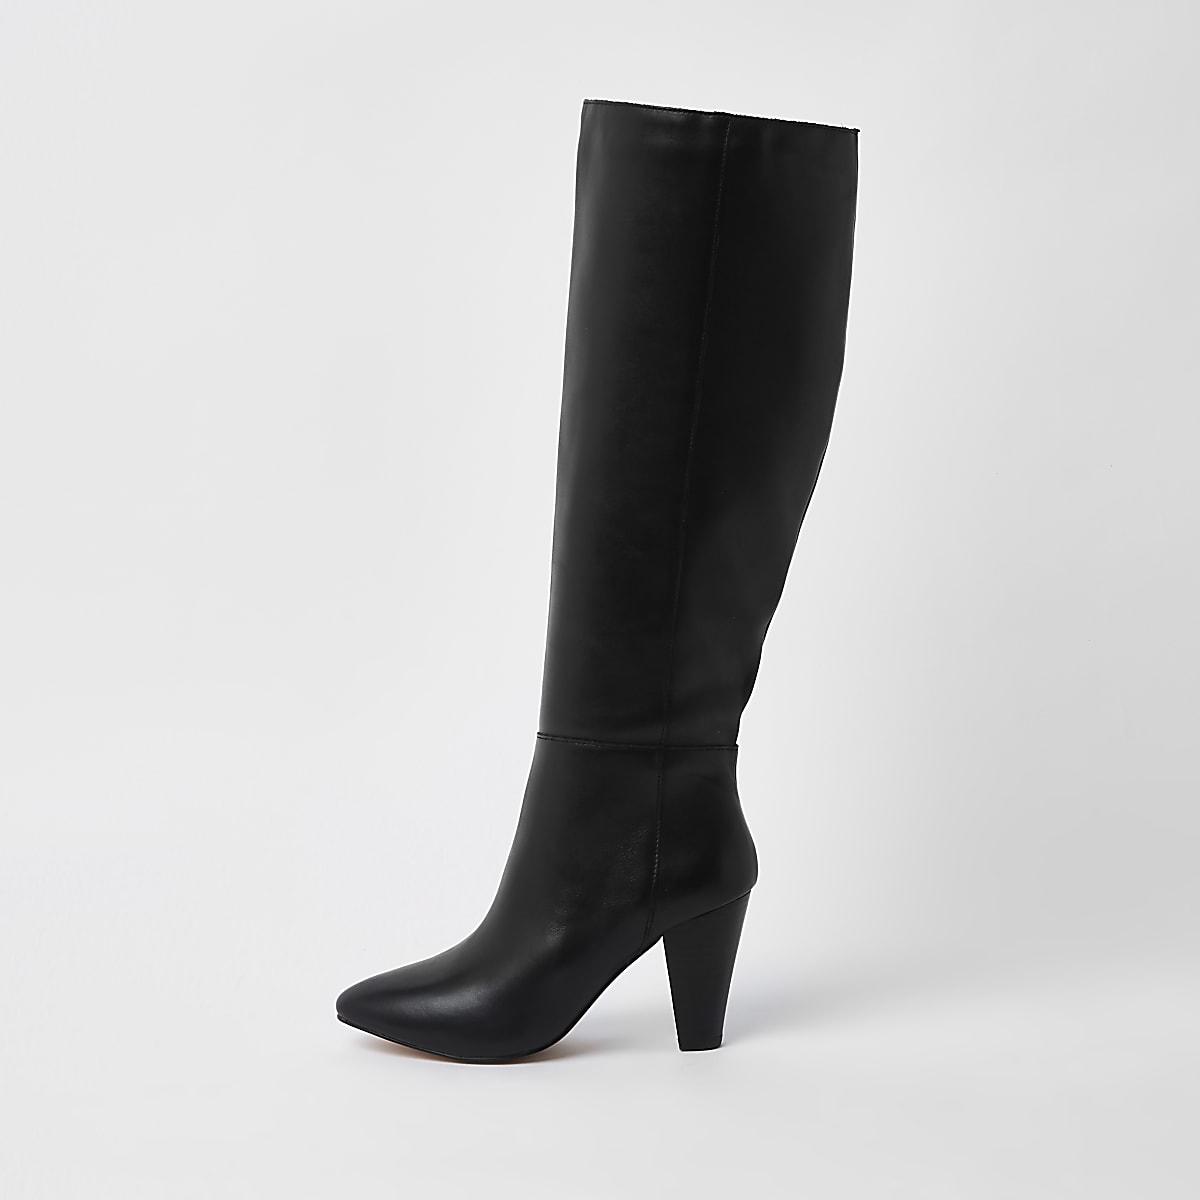 Black leather knee high block heel boots